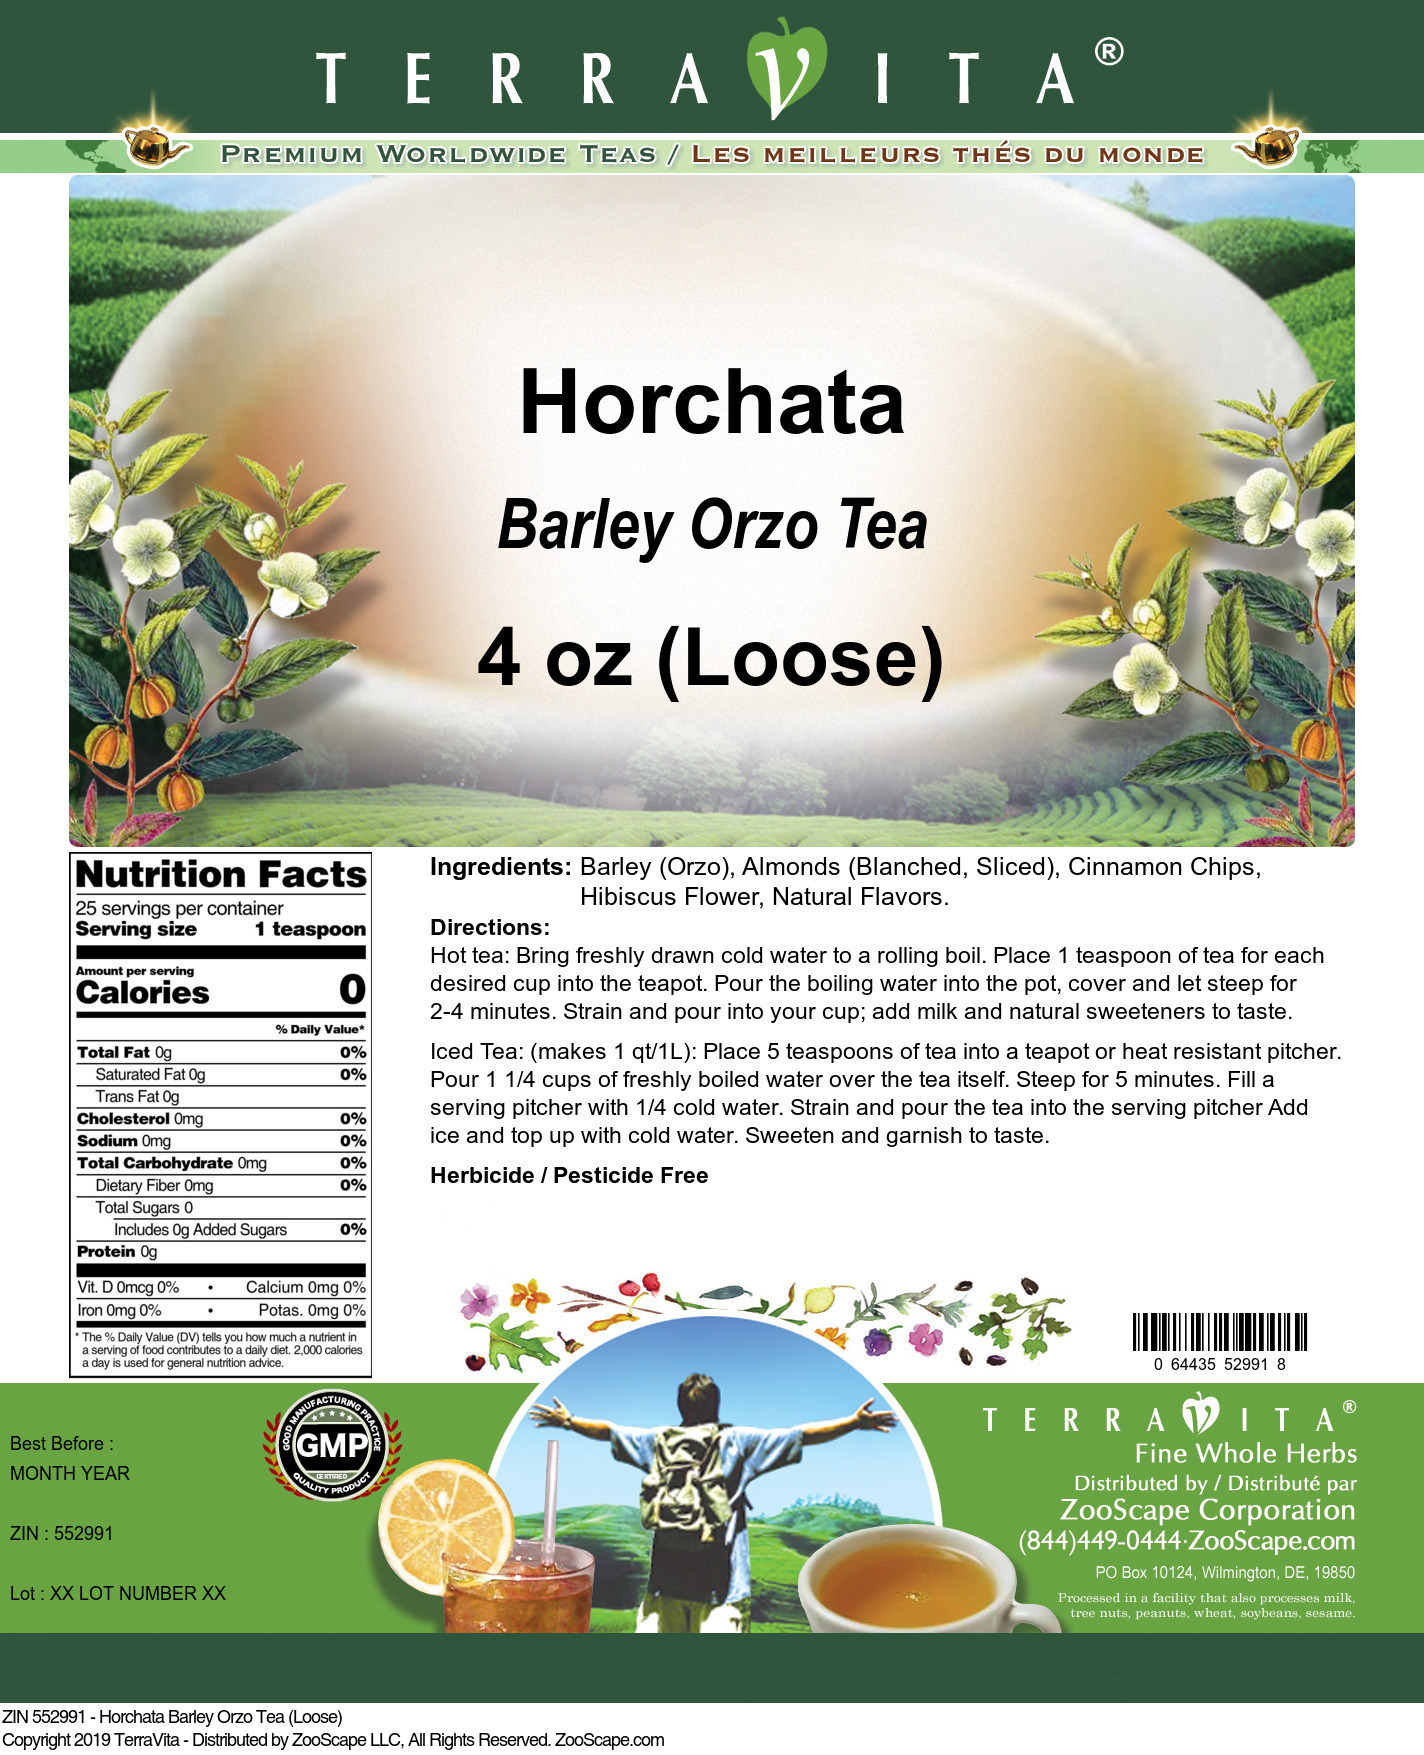 Horchata Barley Orzo